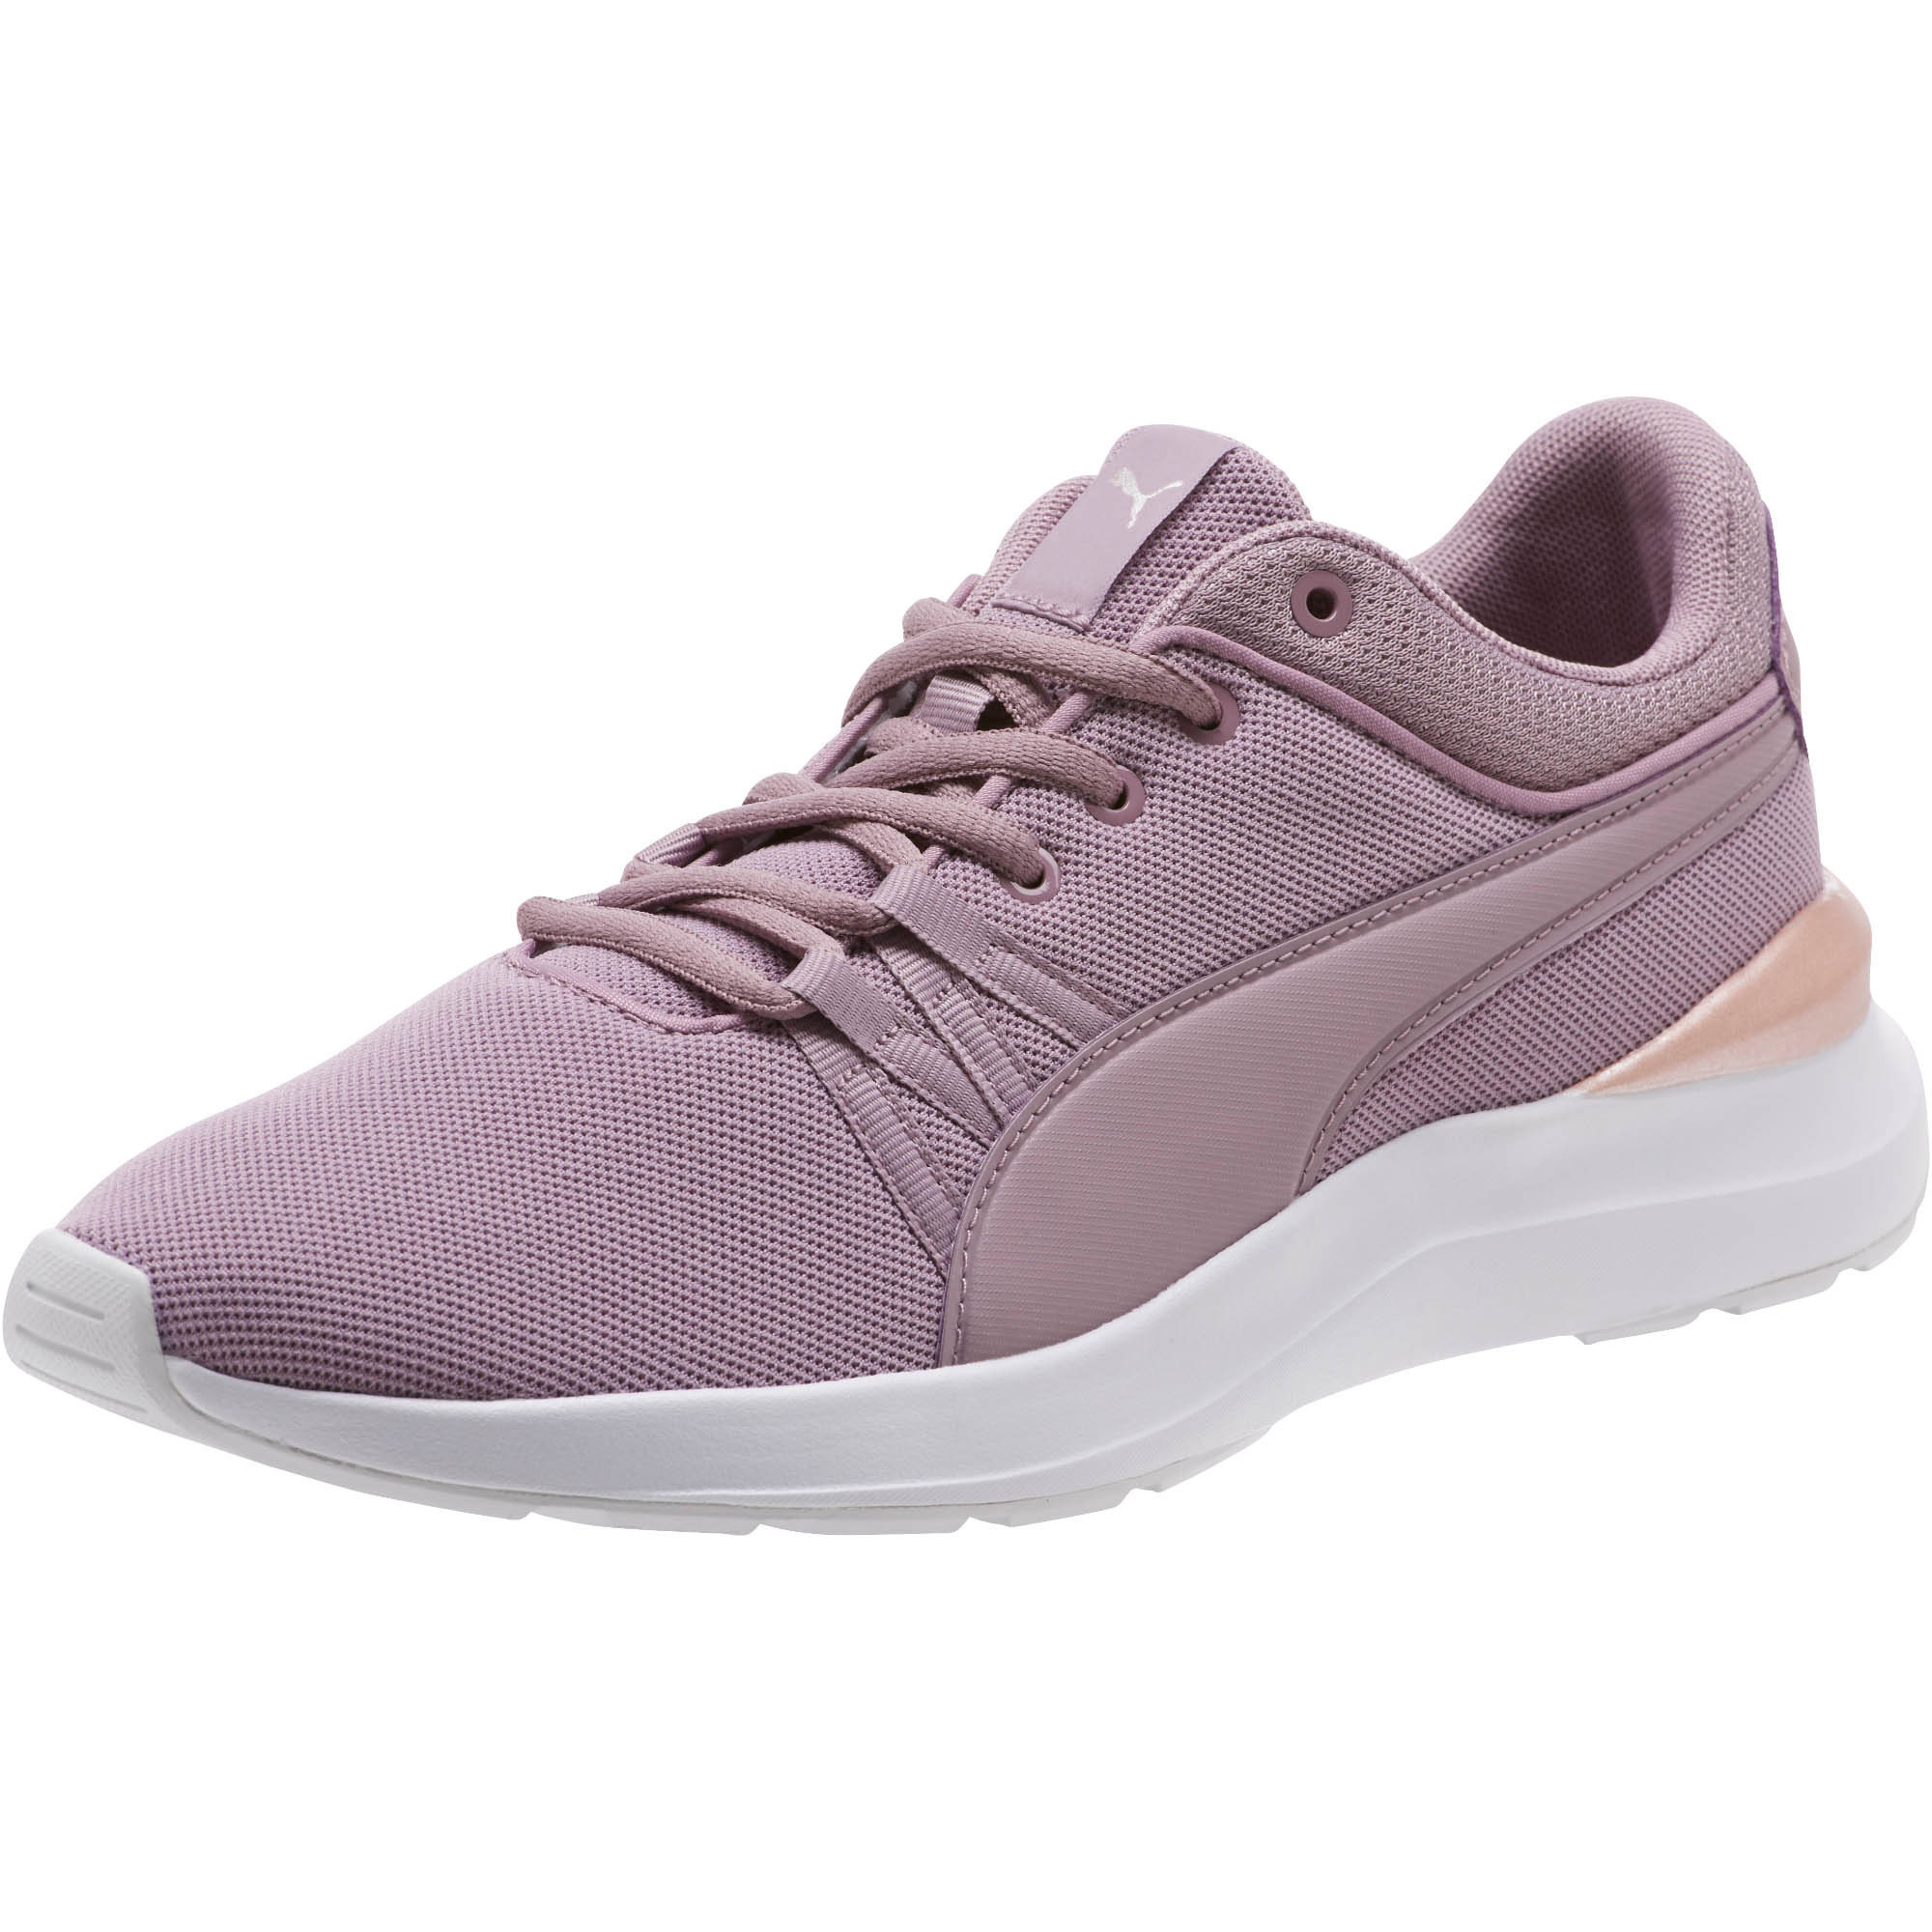 PUMA-Adela-Mesh-Women-s-Sneakers-Women-Shoe-Basics thumbnail 4